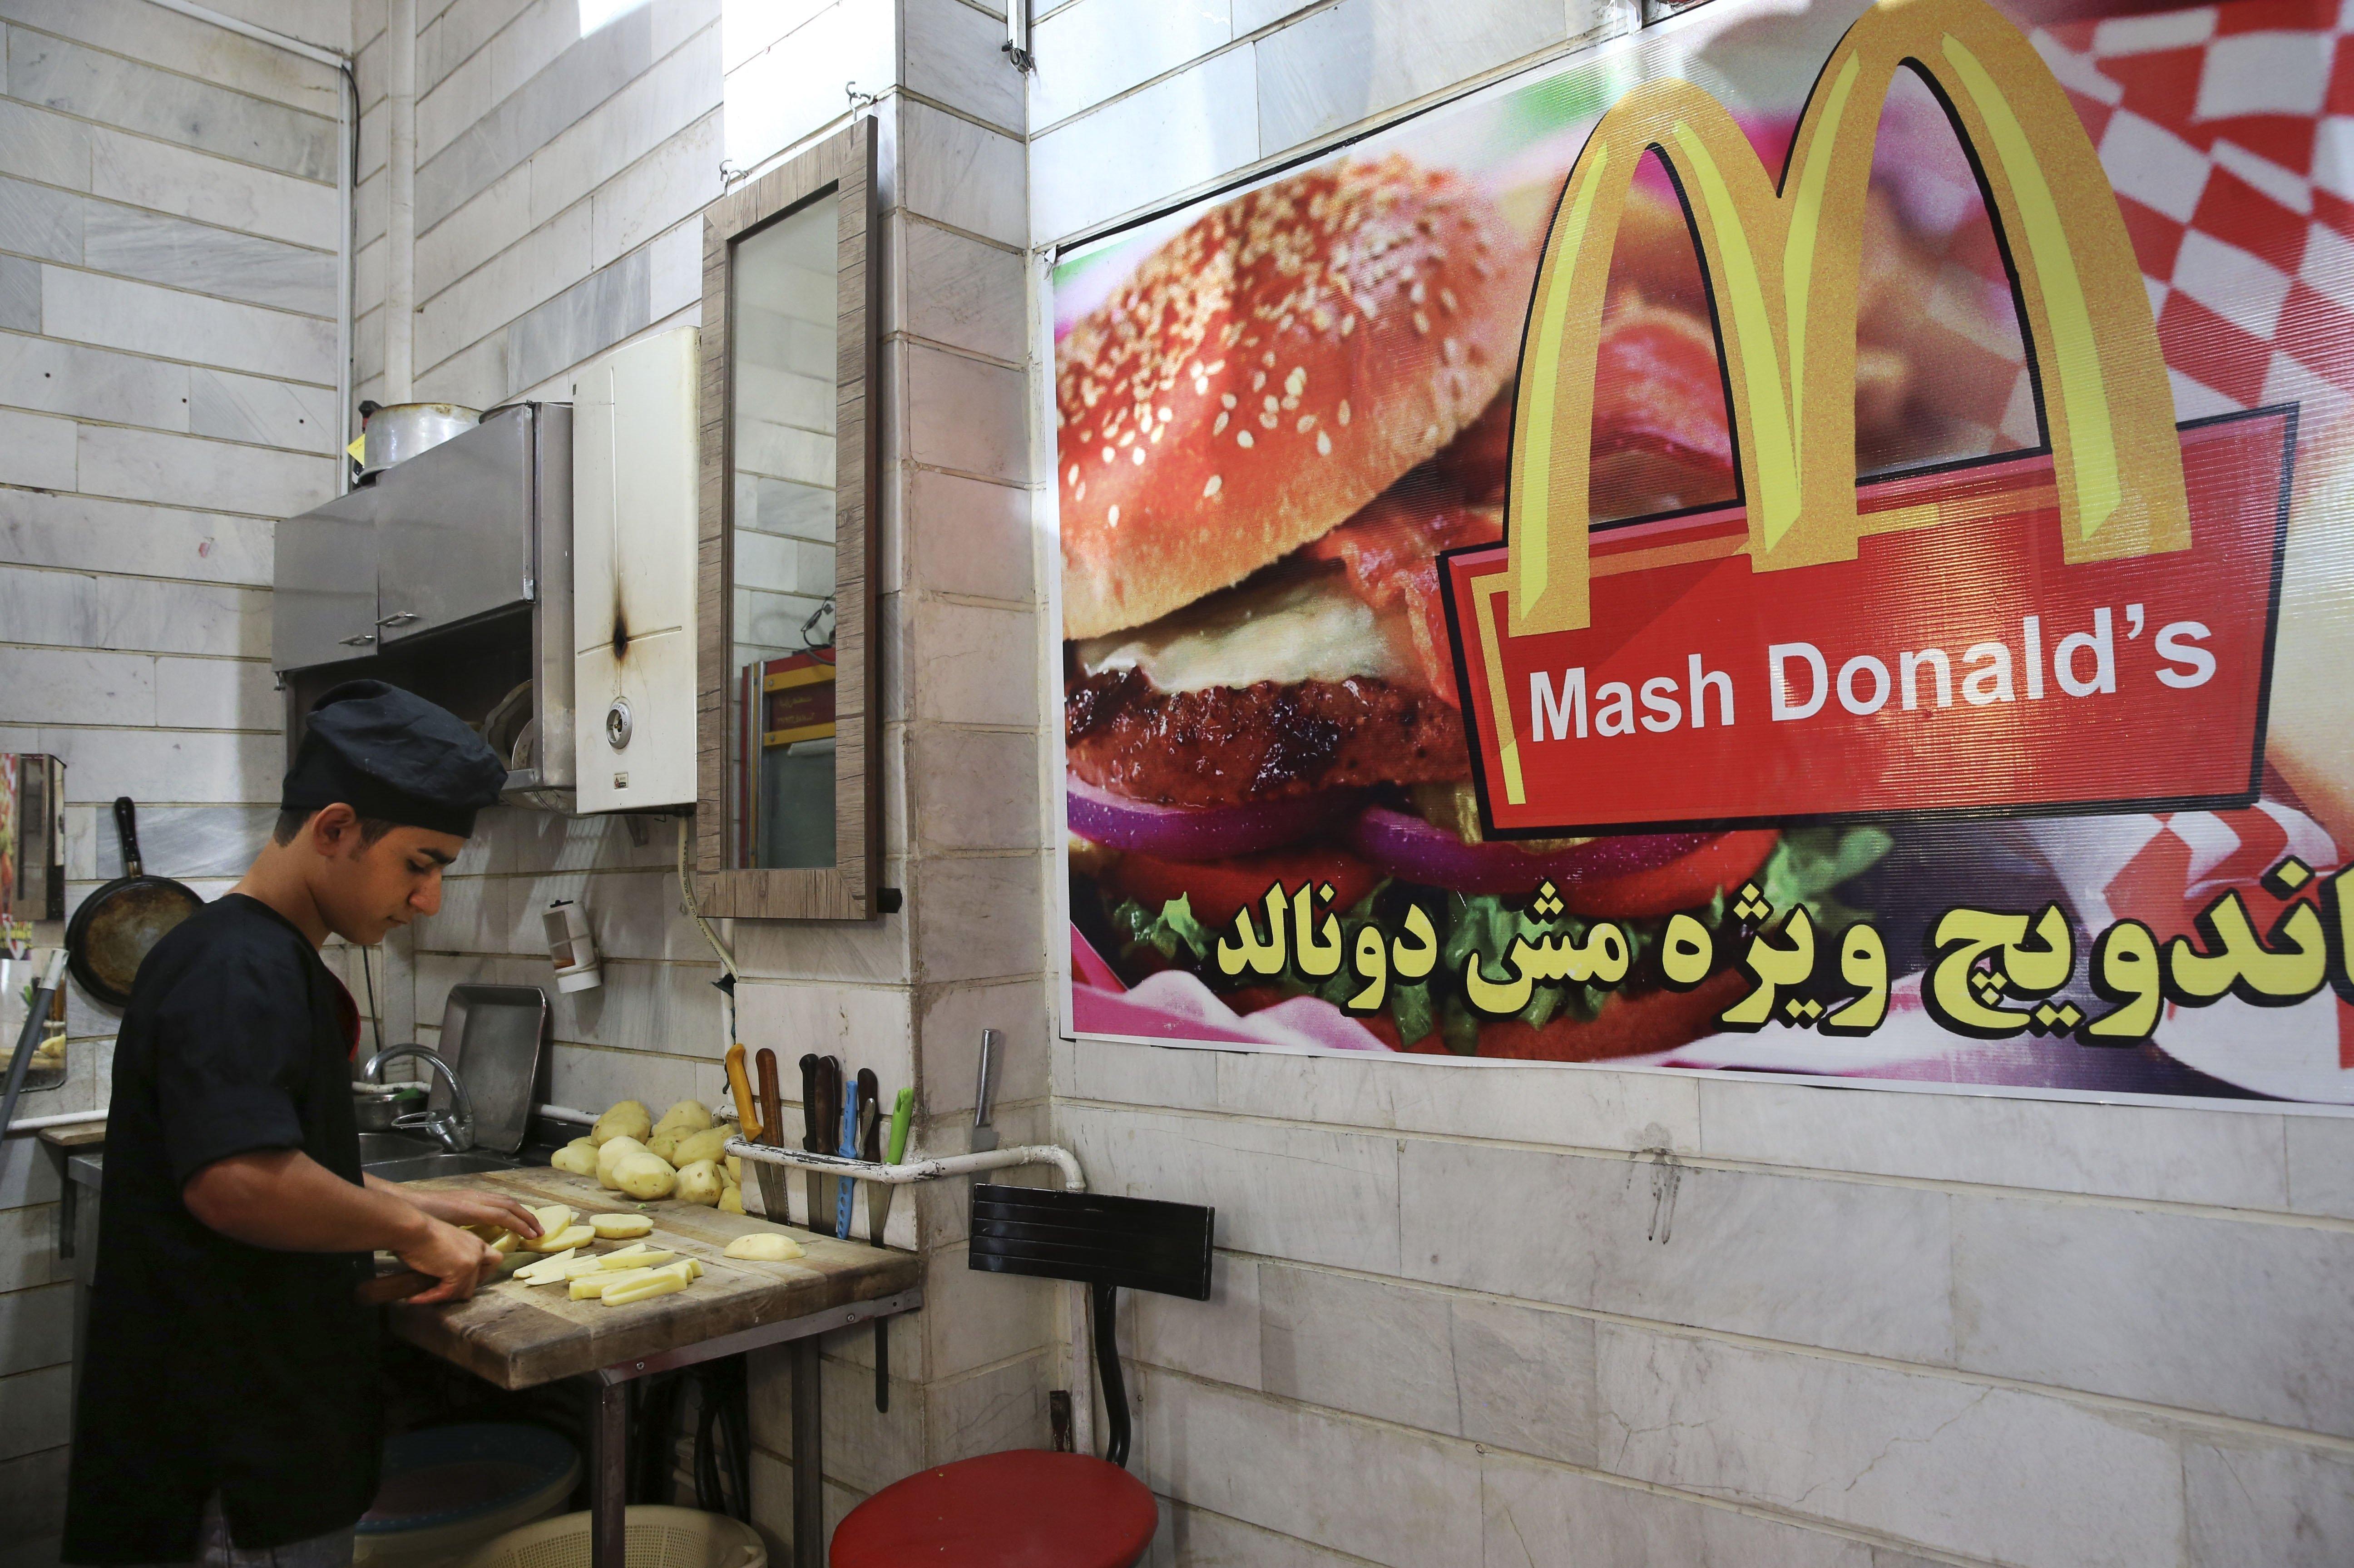 Substitut iranien de McDonald's, Mash Donald's